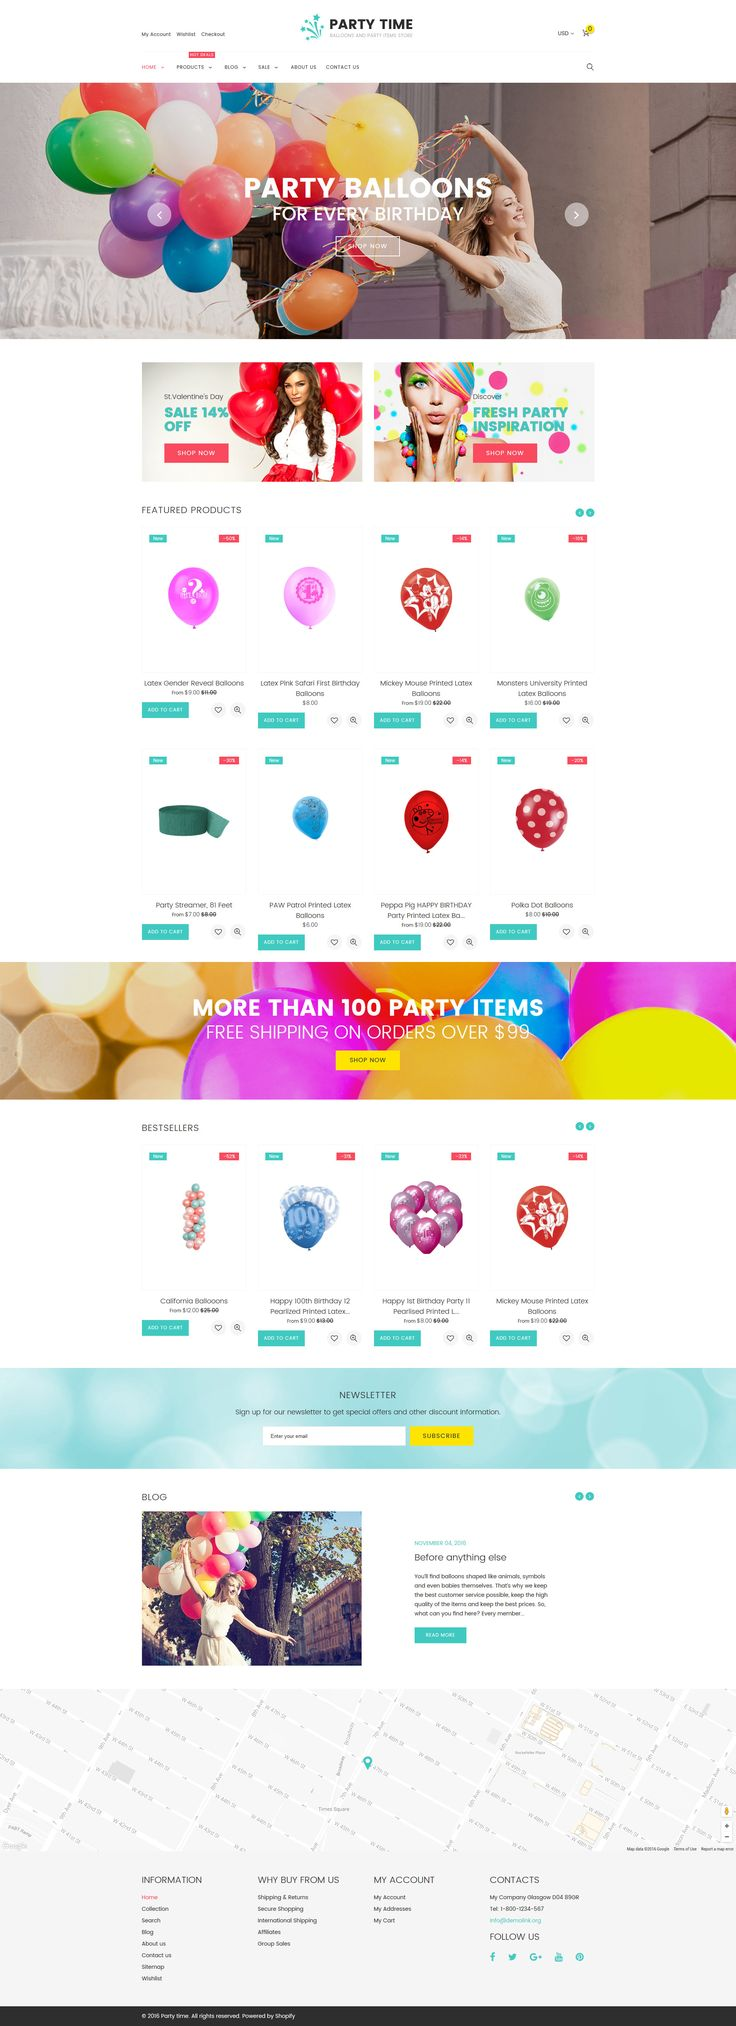 Entertainmnet Responsive Shopify Theme - http://www.templatemonster.com/shopify-themes/entertainmnet-responsive-shopify-theme-61413.html